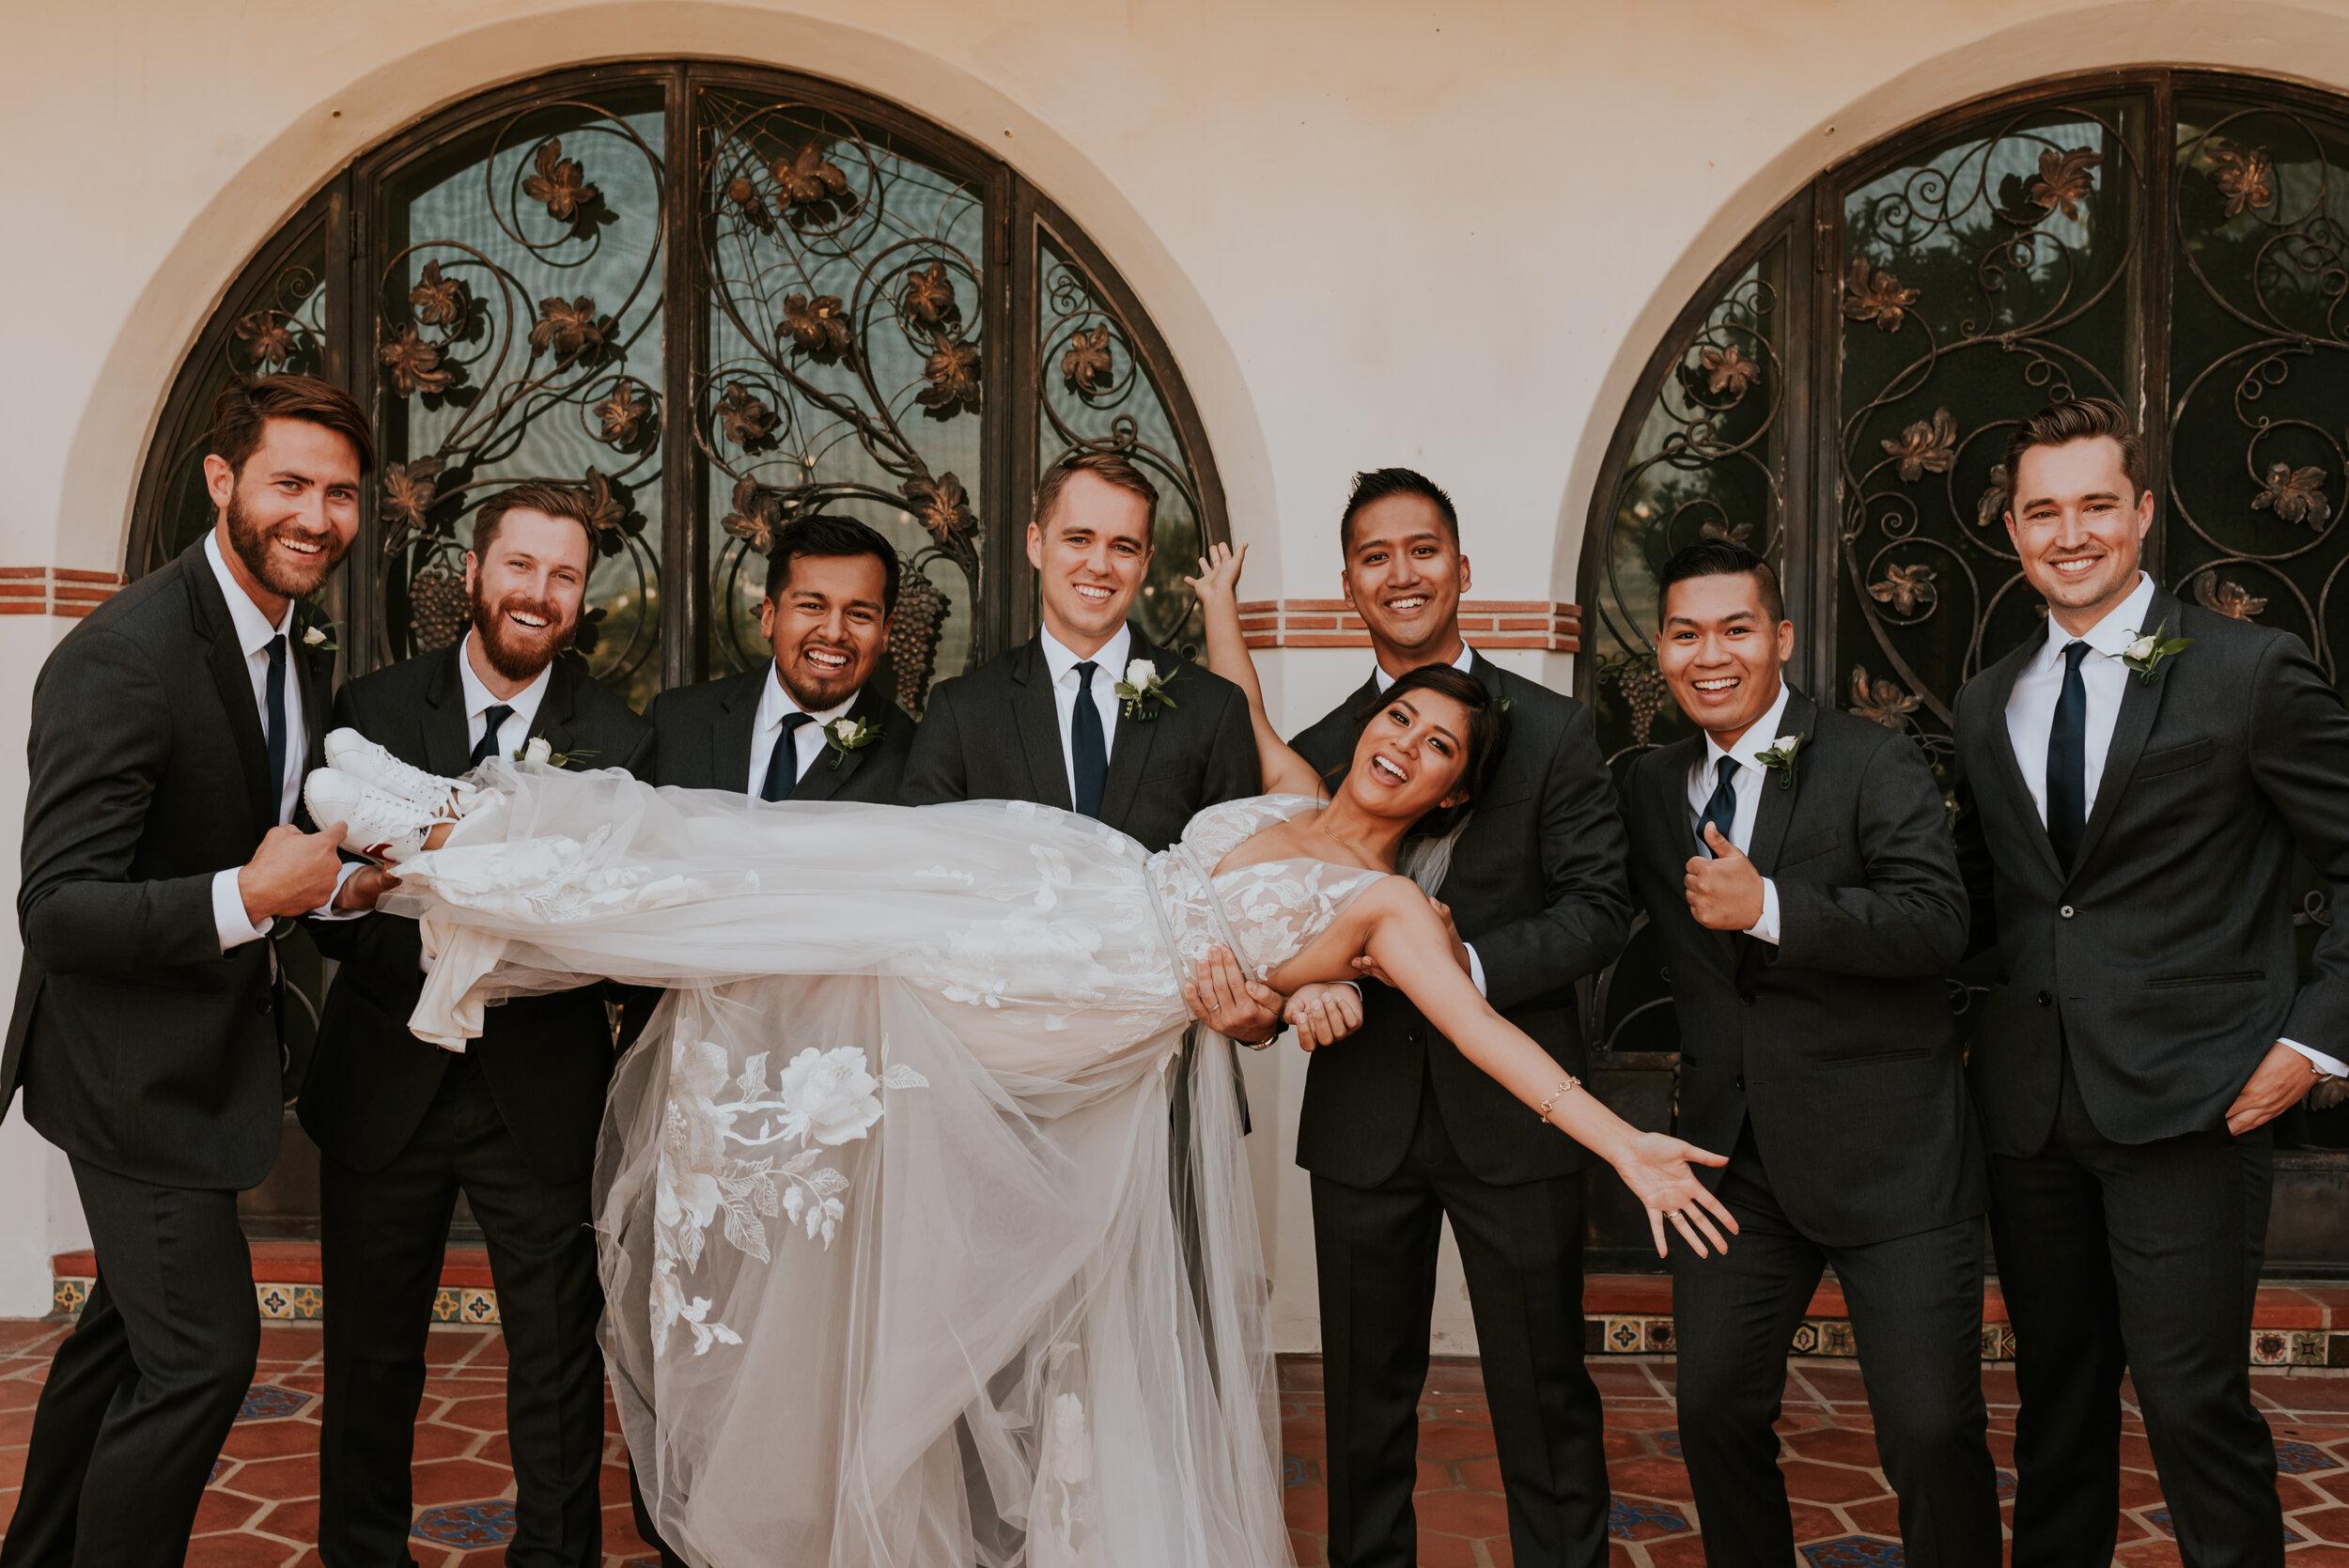 Adamson House Wedding   Malibu Wedding Photographer   Seaside California Wedding Venue   Summer Wedding